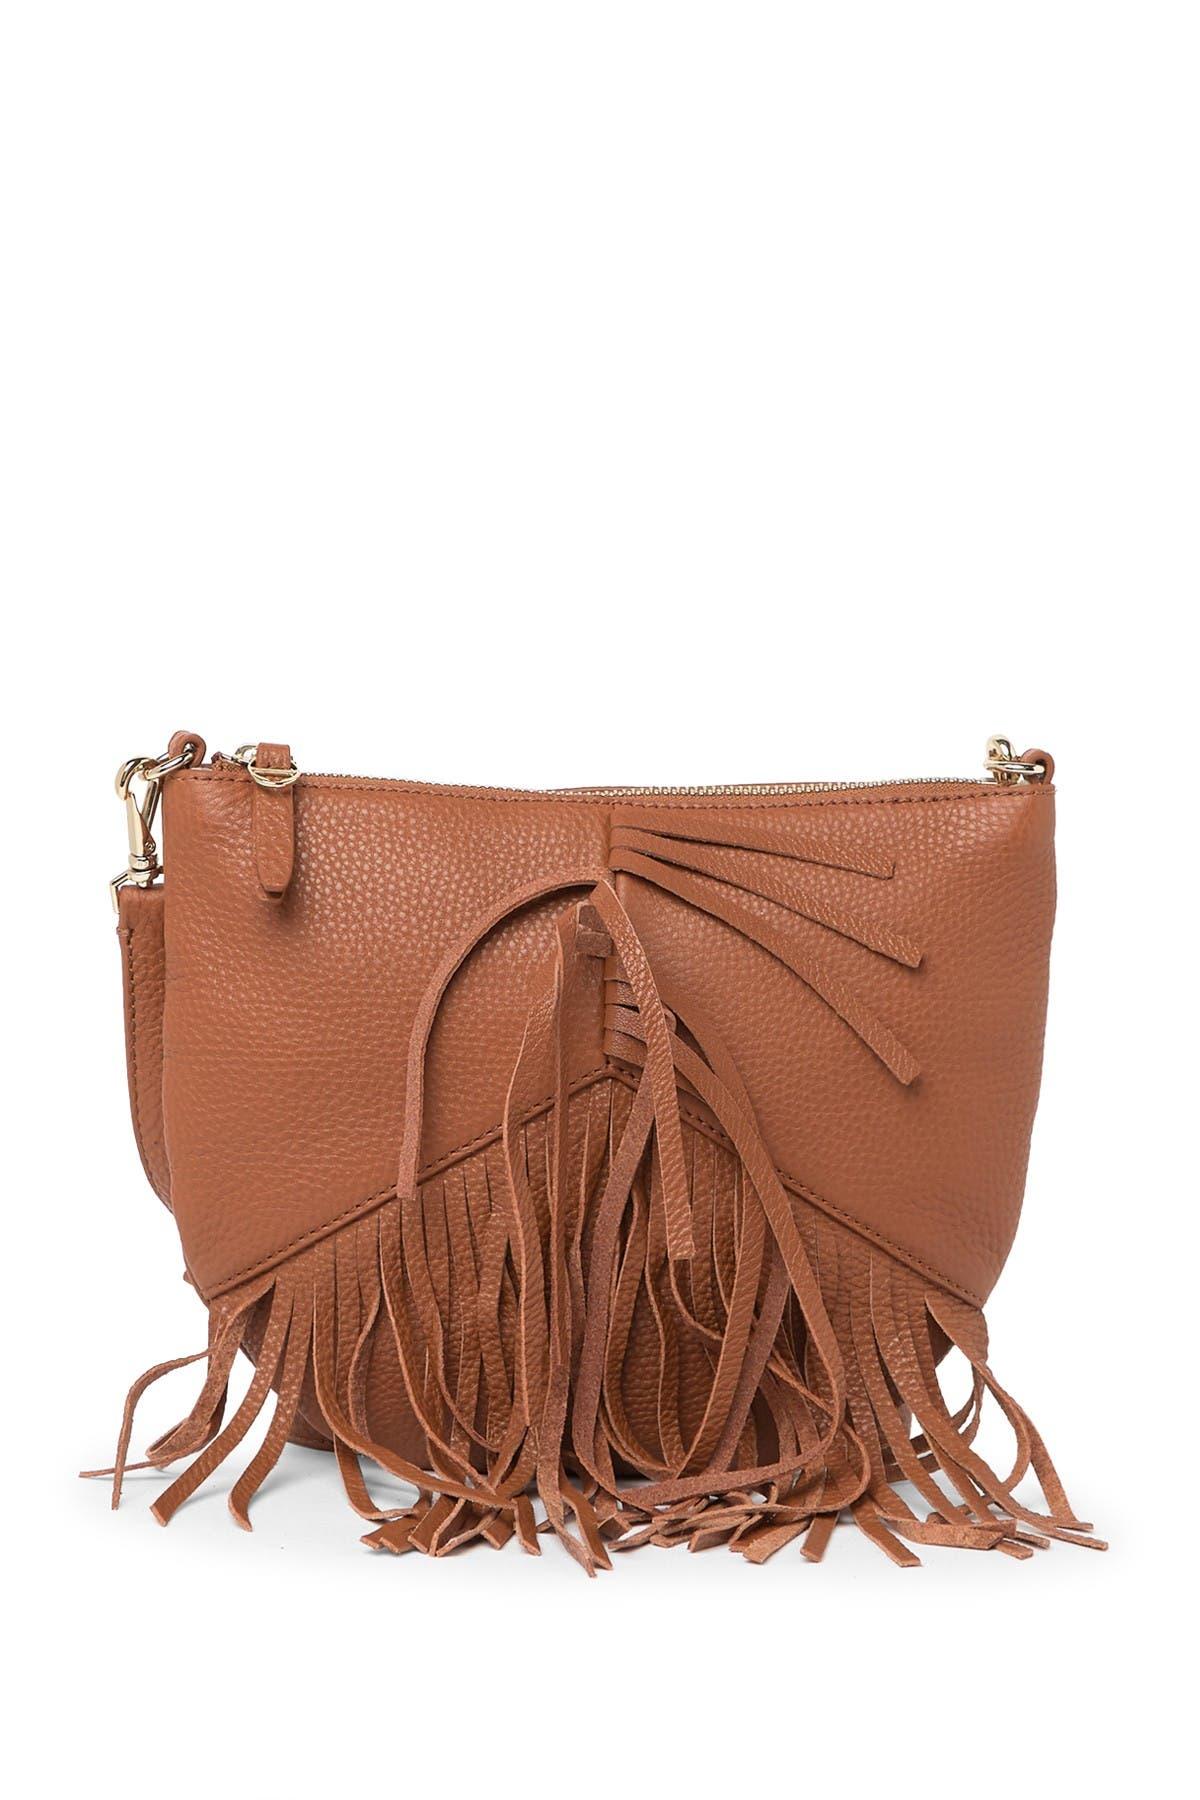 Image of Etienne Aigner Moda Fringe Leather Crossbody Bag